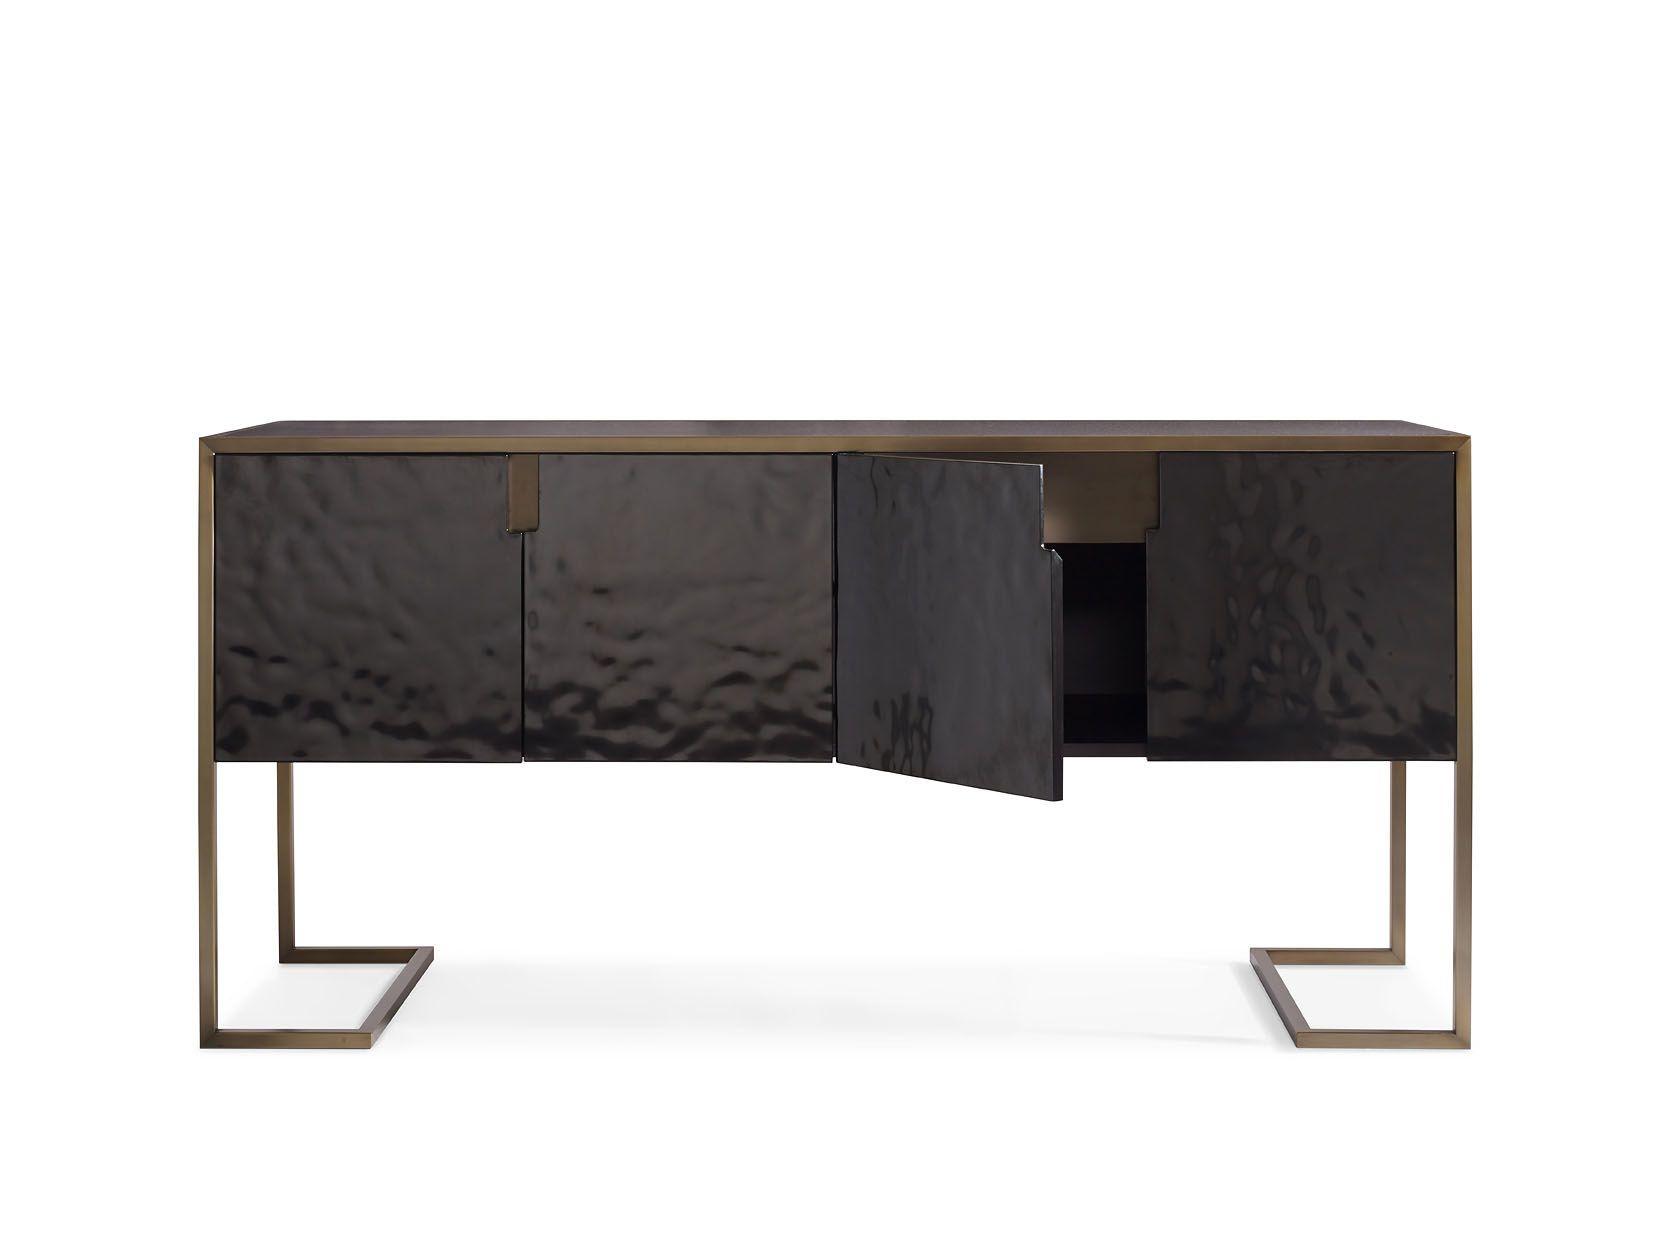 Charming A Closer Look At Kara Mannu0027s Sleek Furniture Collection For Baker